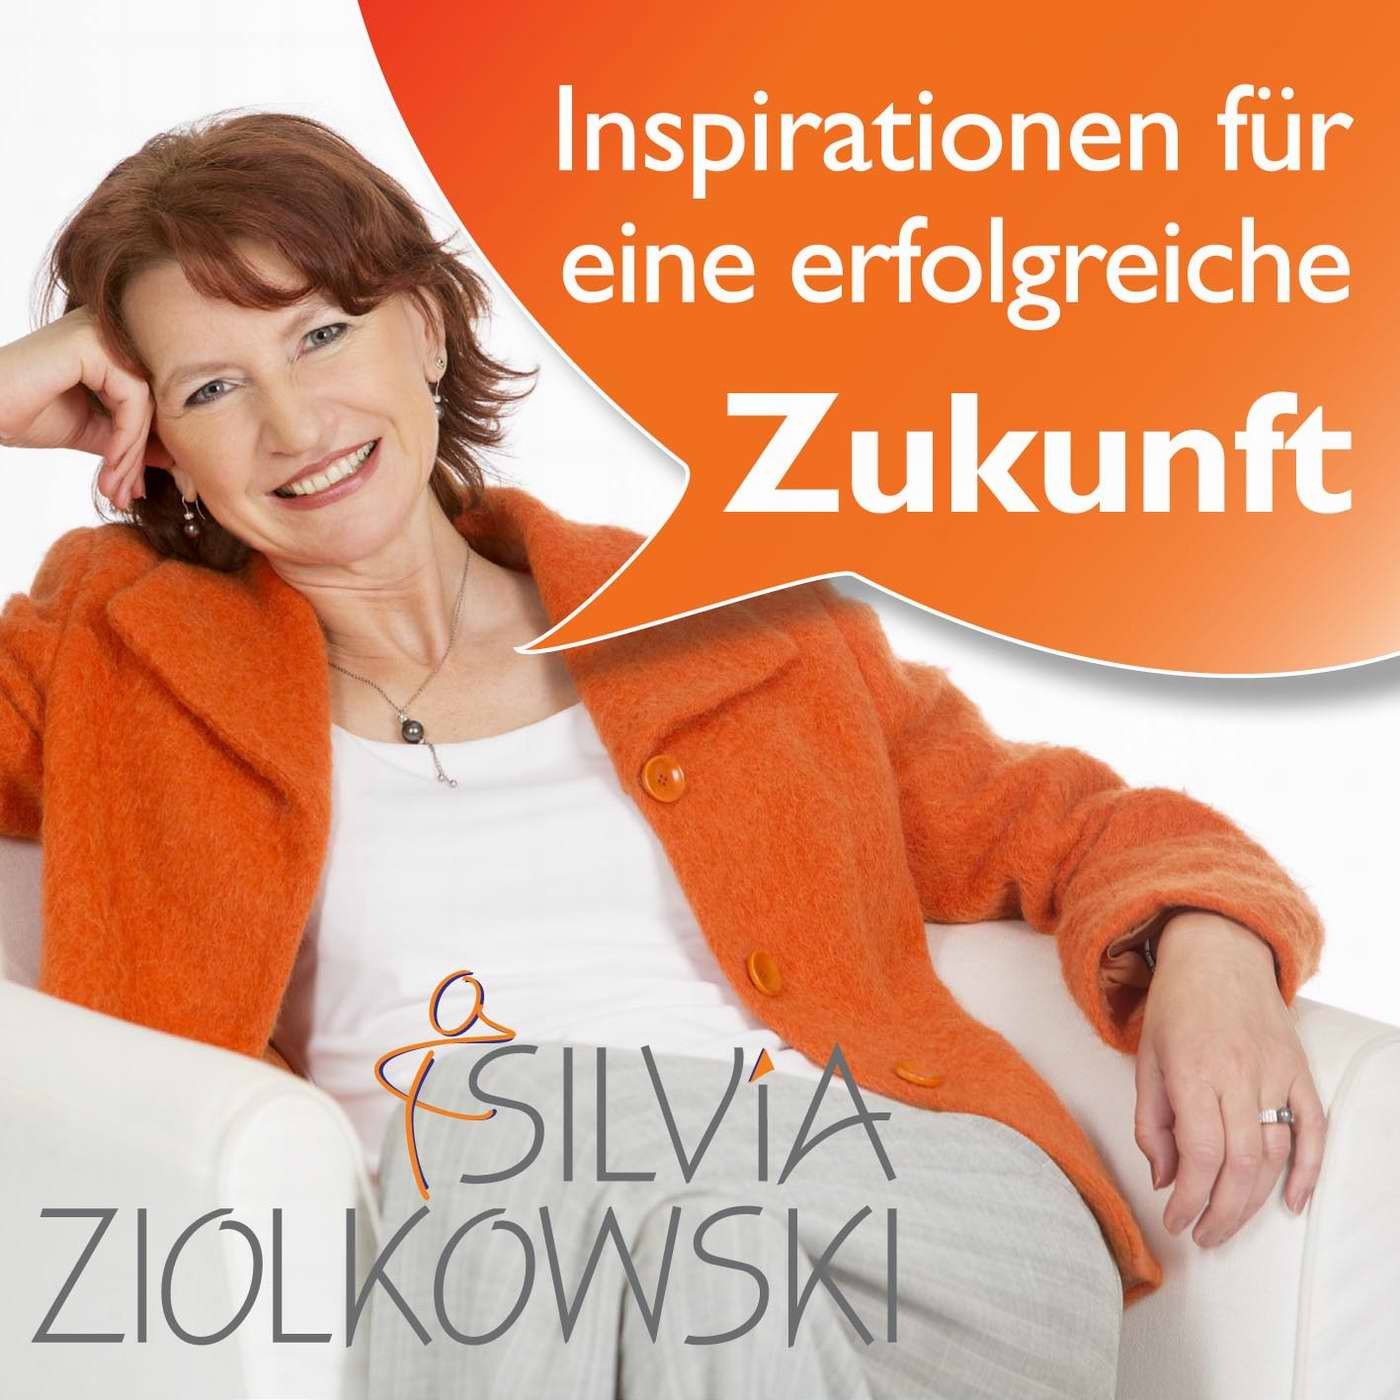 Silvia Ziolkowski - Visionäre inspirieren